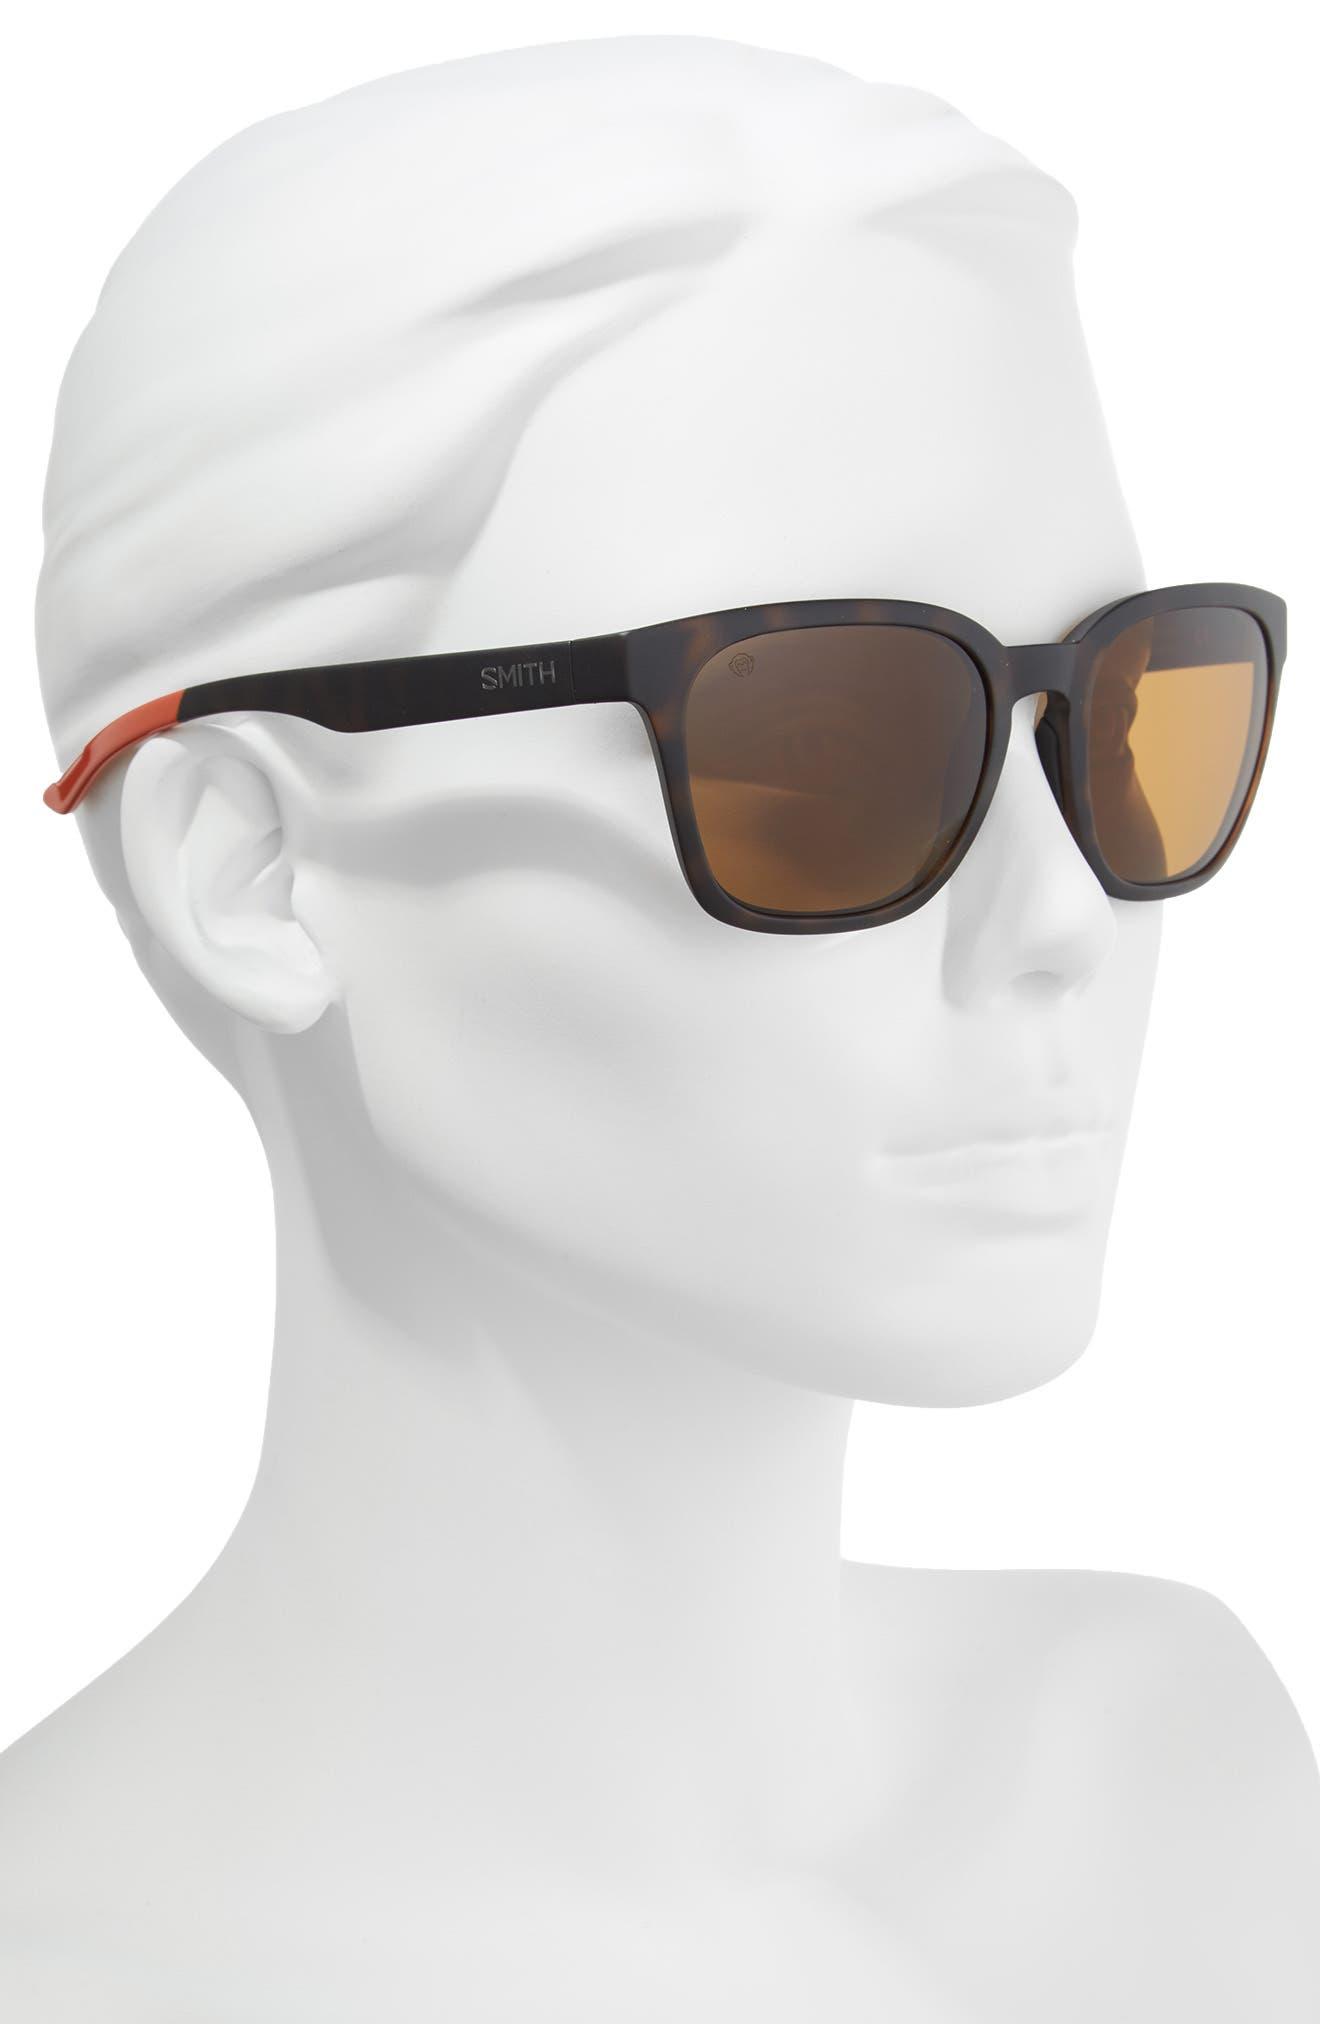 Founder 56mm ChromaPop Polarized Sunglasses,                             Alternate thumbnail 3, color,